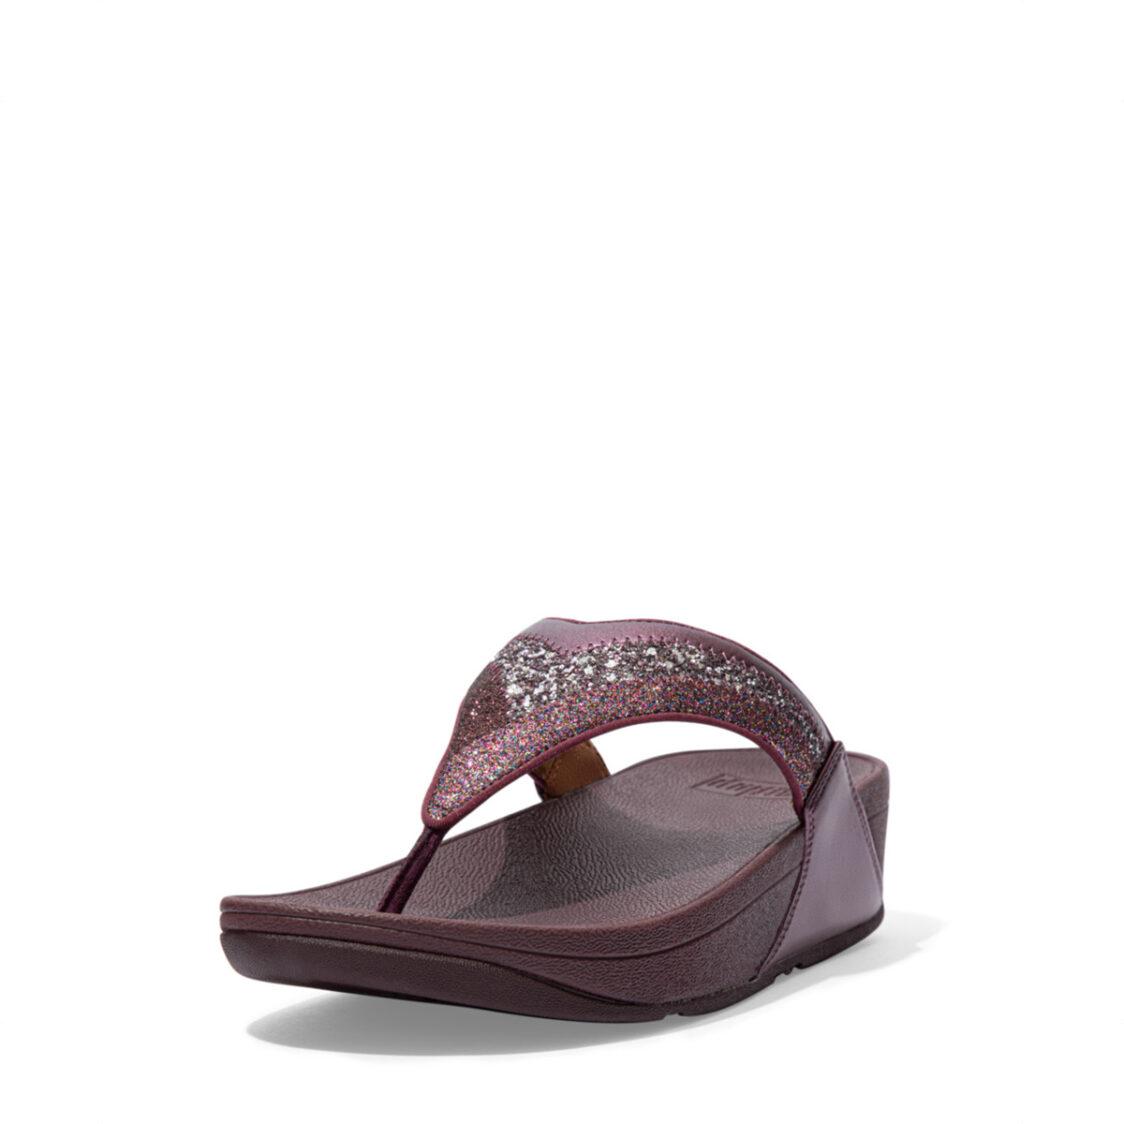 Fitflop Lulu Ombre Glitter Toe-Post Sandals Eggplant Purple Dl2-889